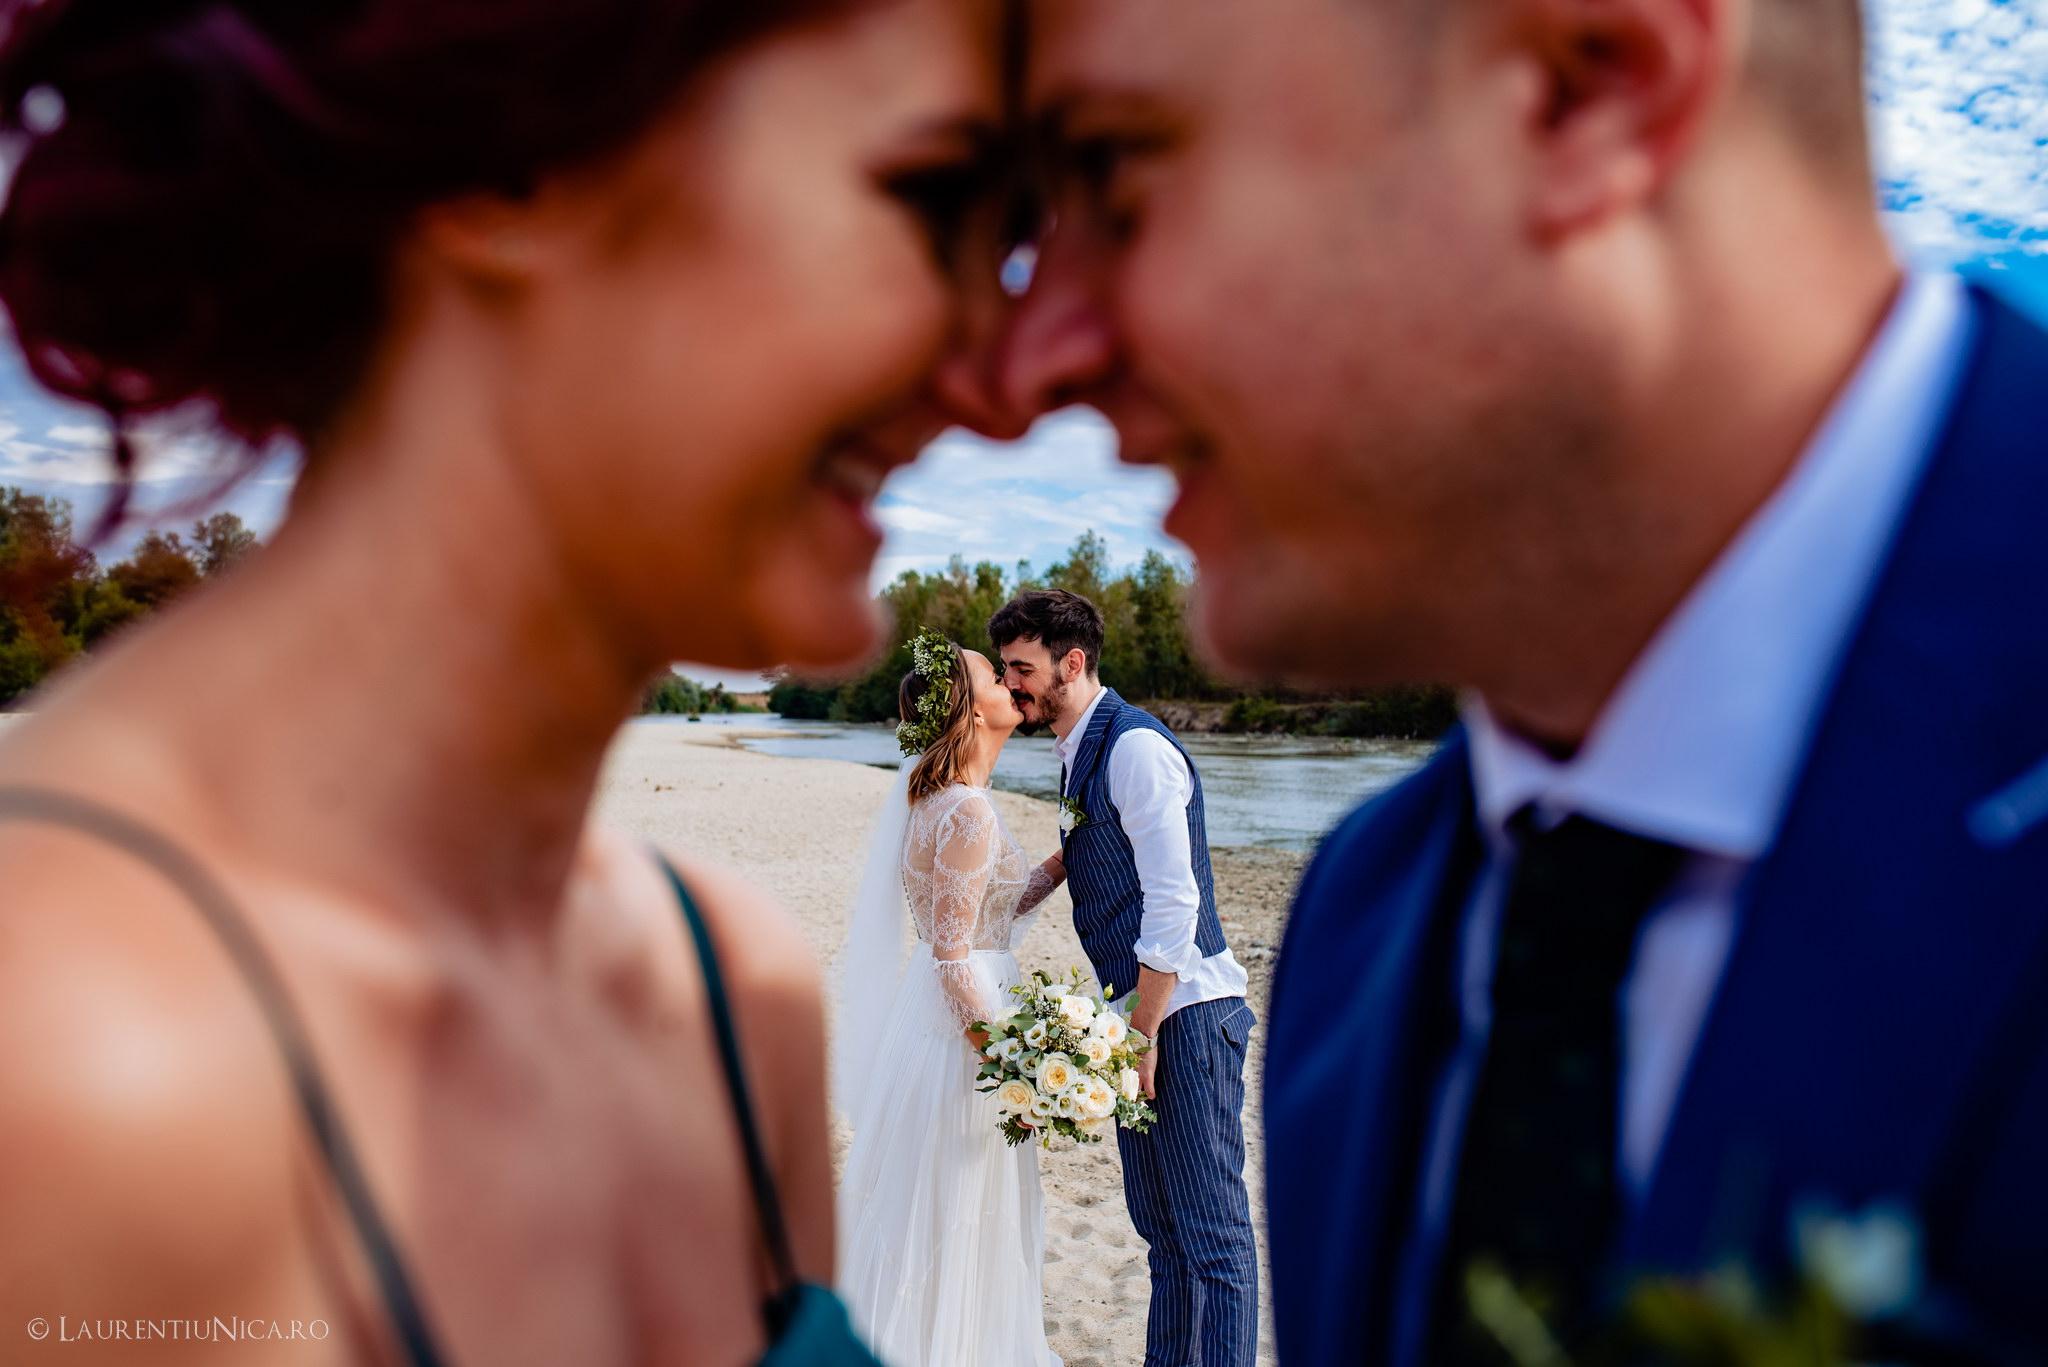 20180915 LN 0639 - Diana & Marius | Fotografii nunta | Slatina